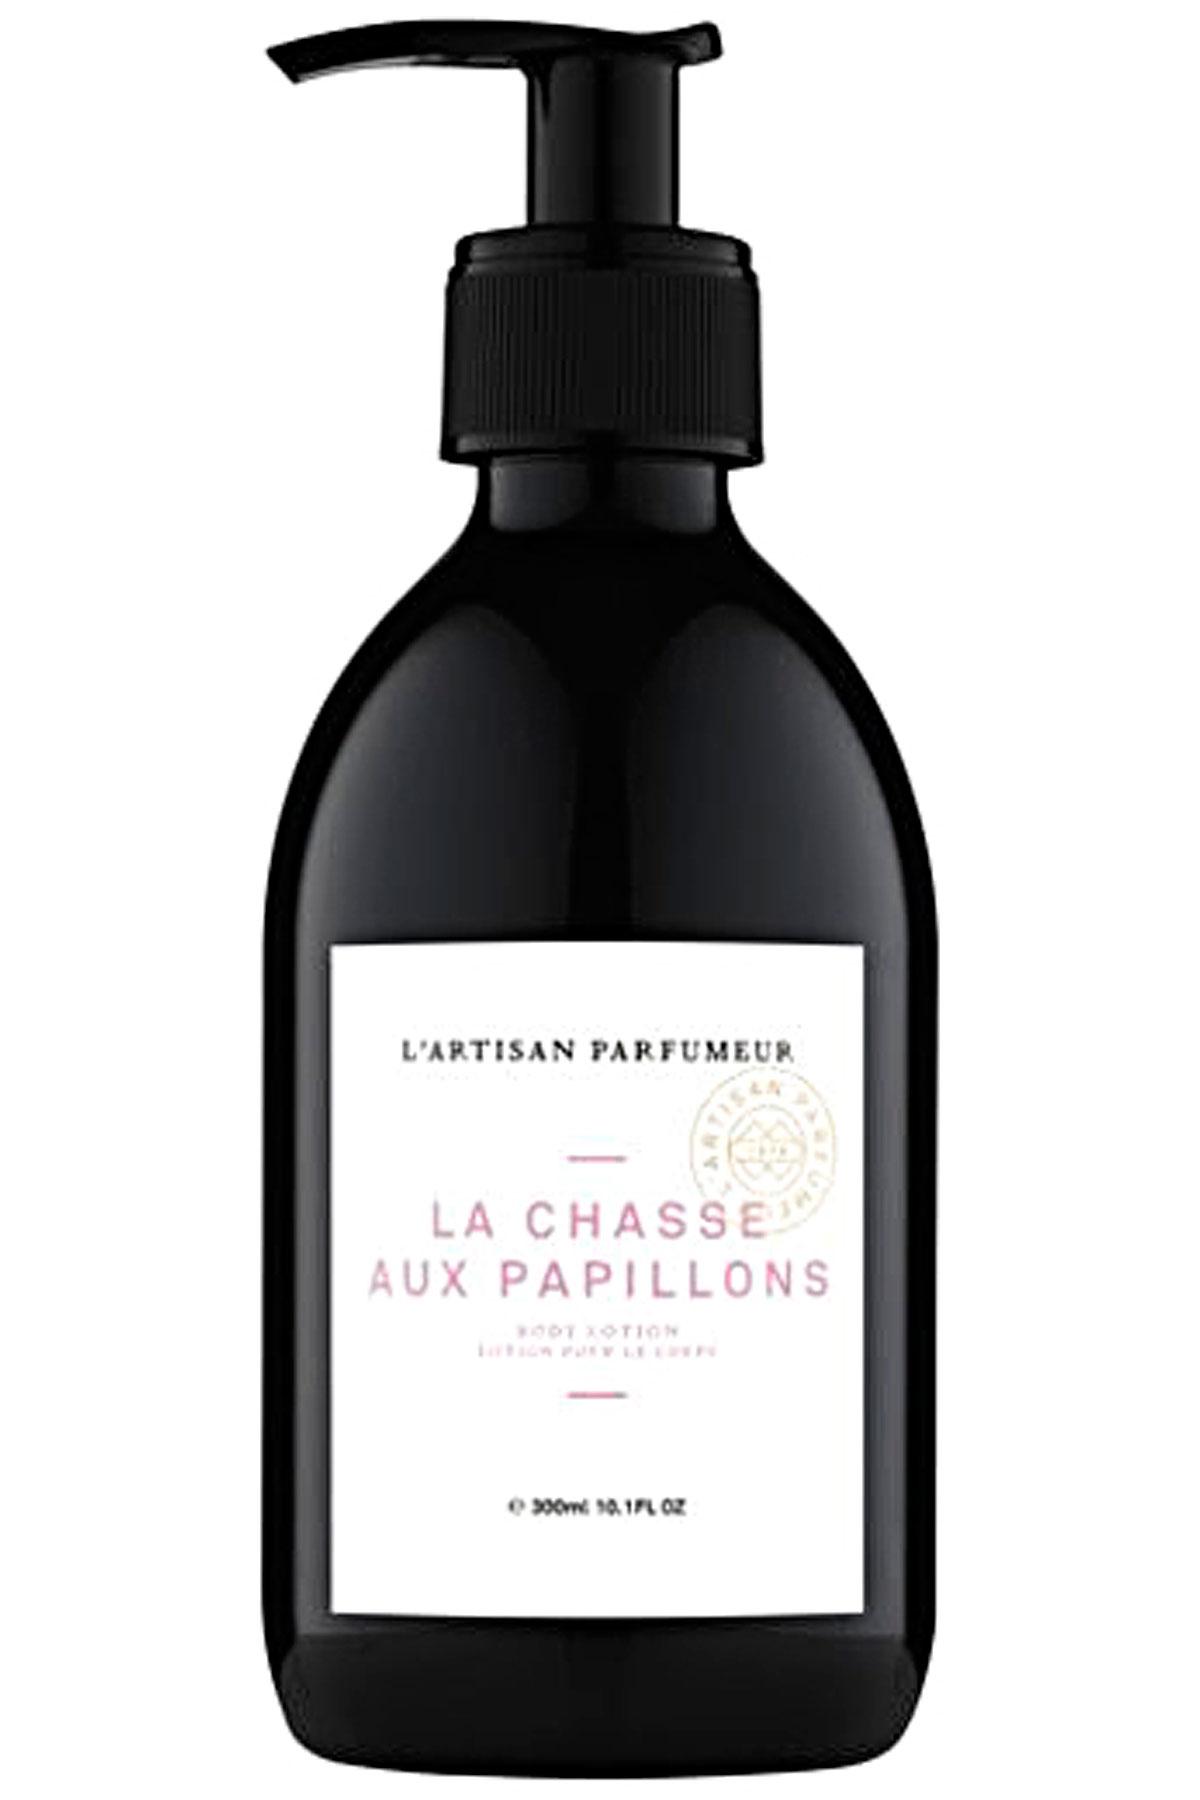 Artisan Parfumeur Beauty for Women, La Chasse Aux Papillons - Body Lotion - 300 Ml, 2019, 300 ml